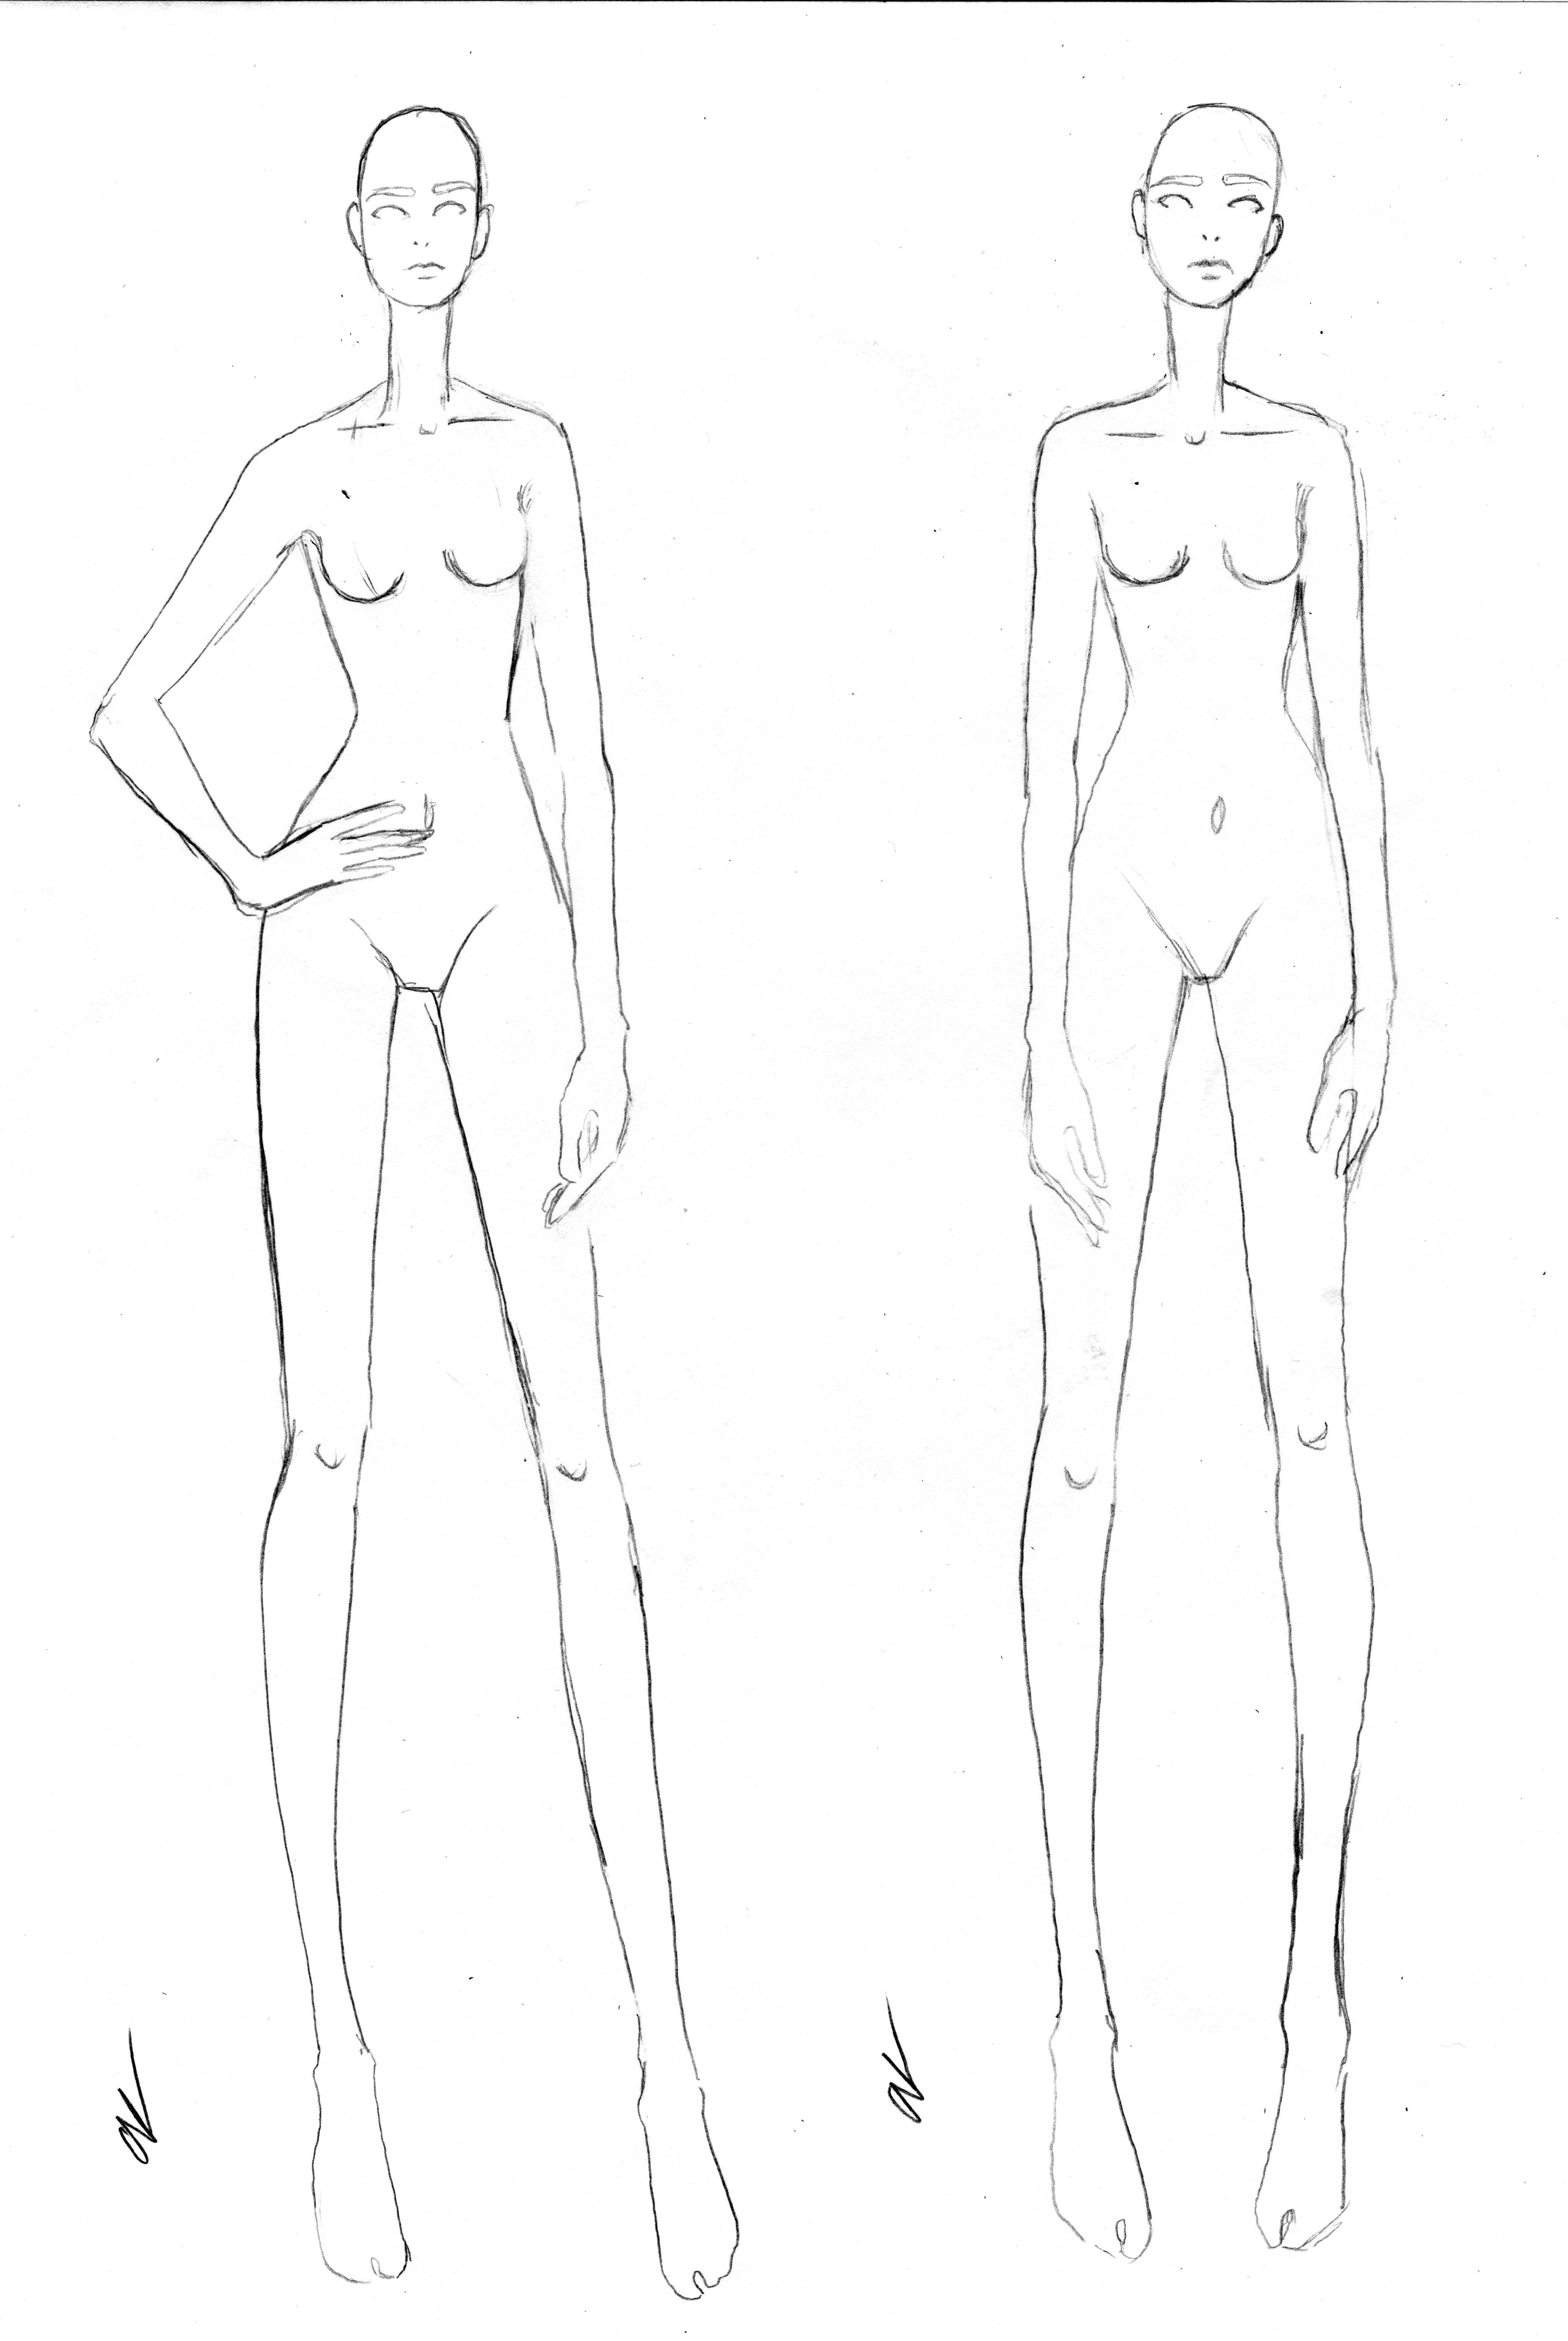 How To Draw a Fashion Croquis